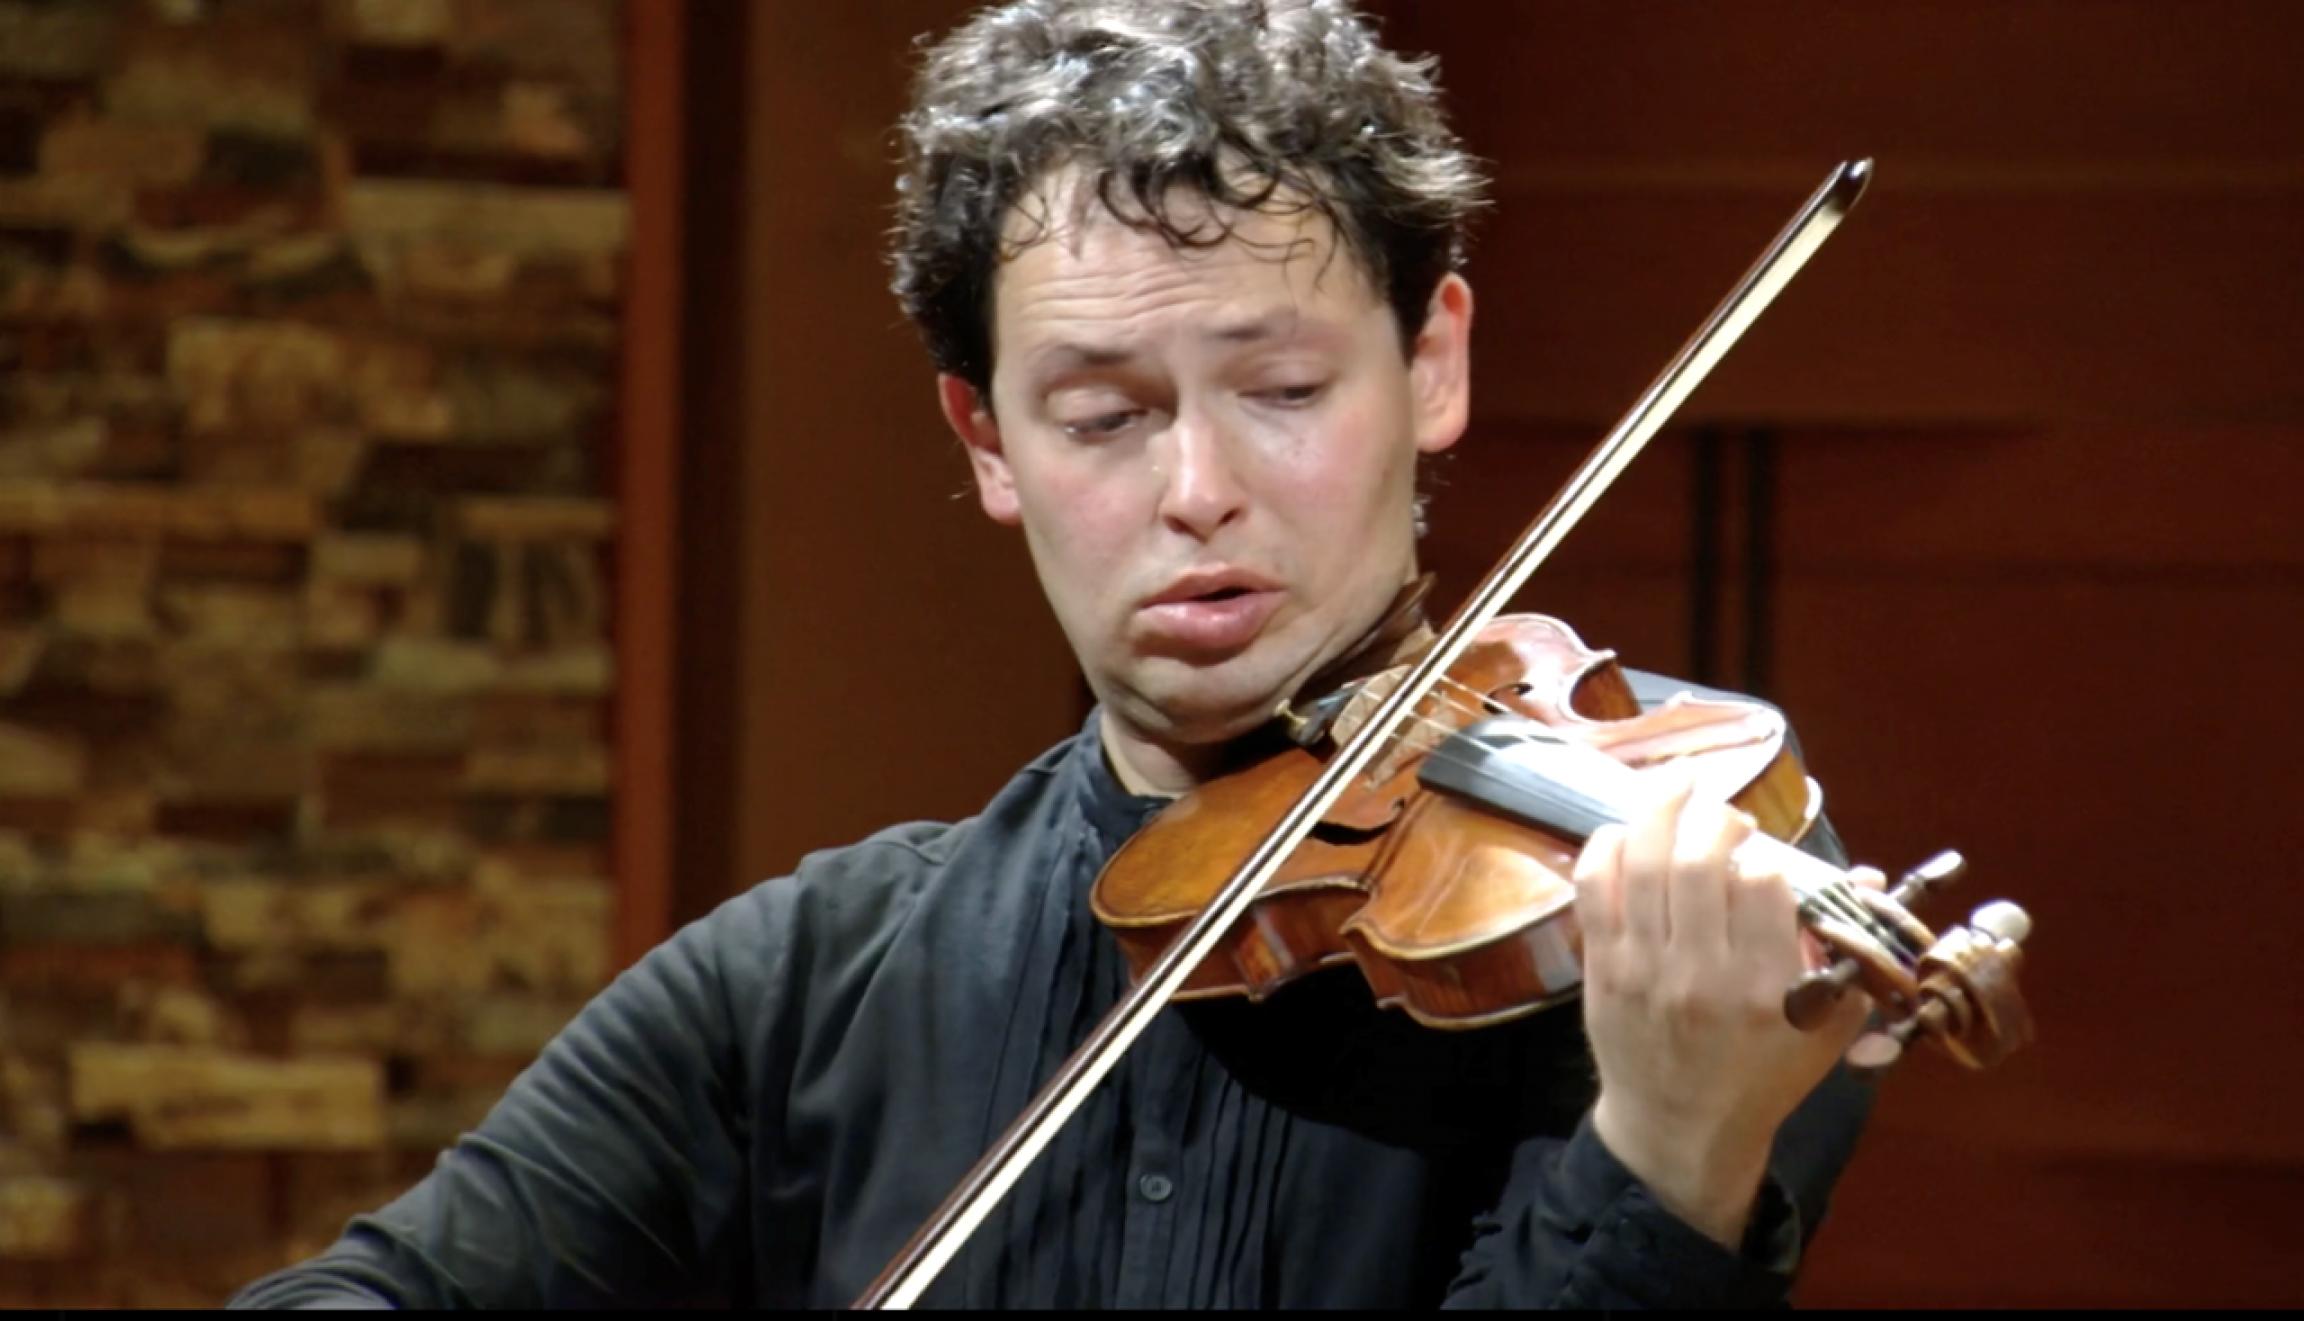 A man holds a violin